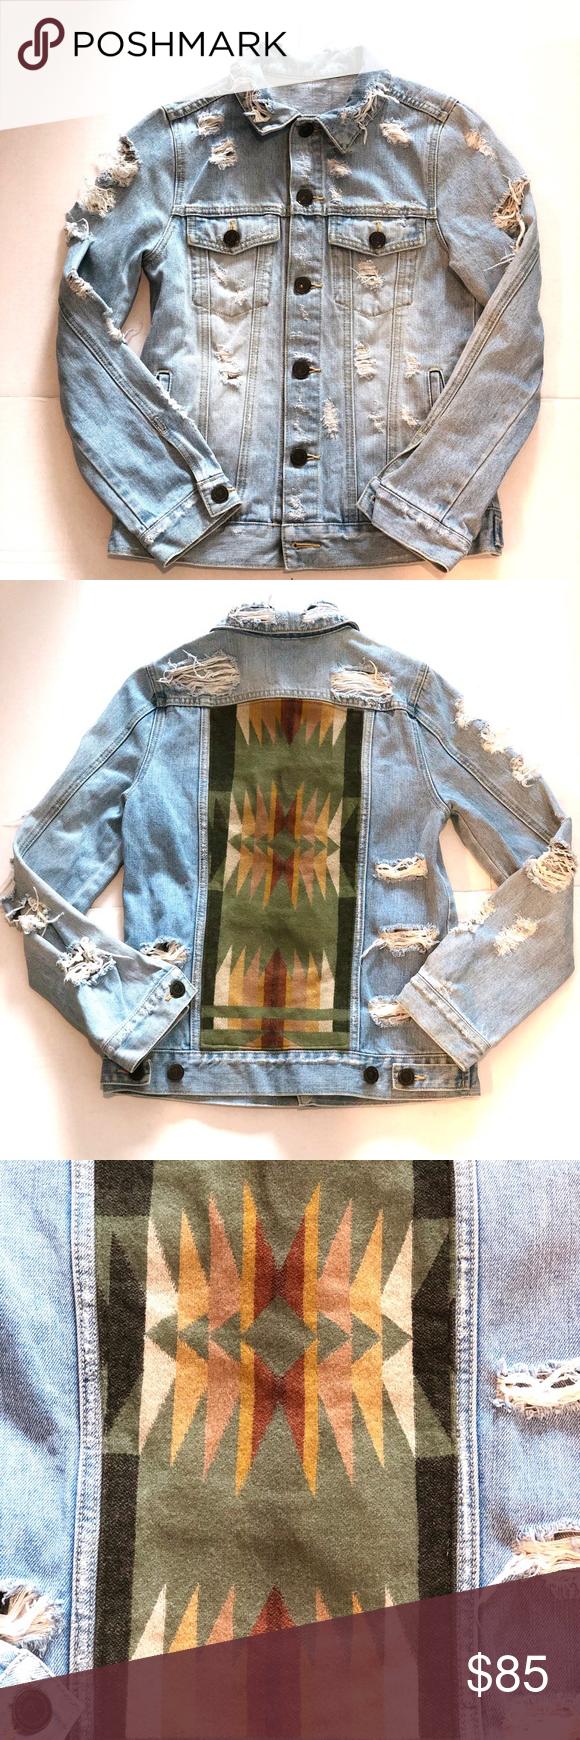 Custom Made Pendleton Jeans Jacket Size S Jackets Jean Jacket Pendleton [ 1740 x 580 Pixel ]